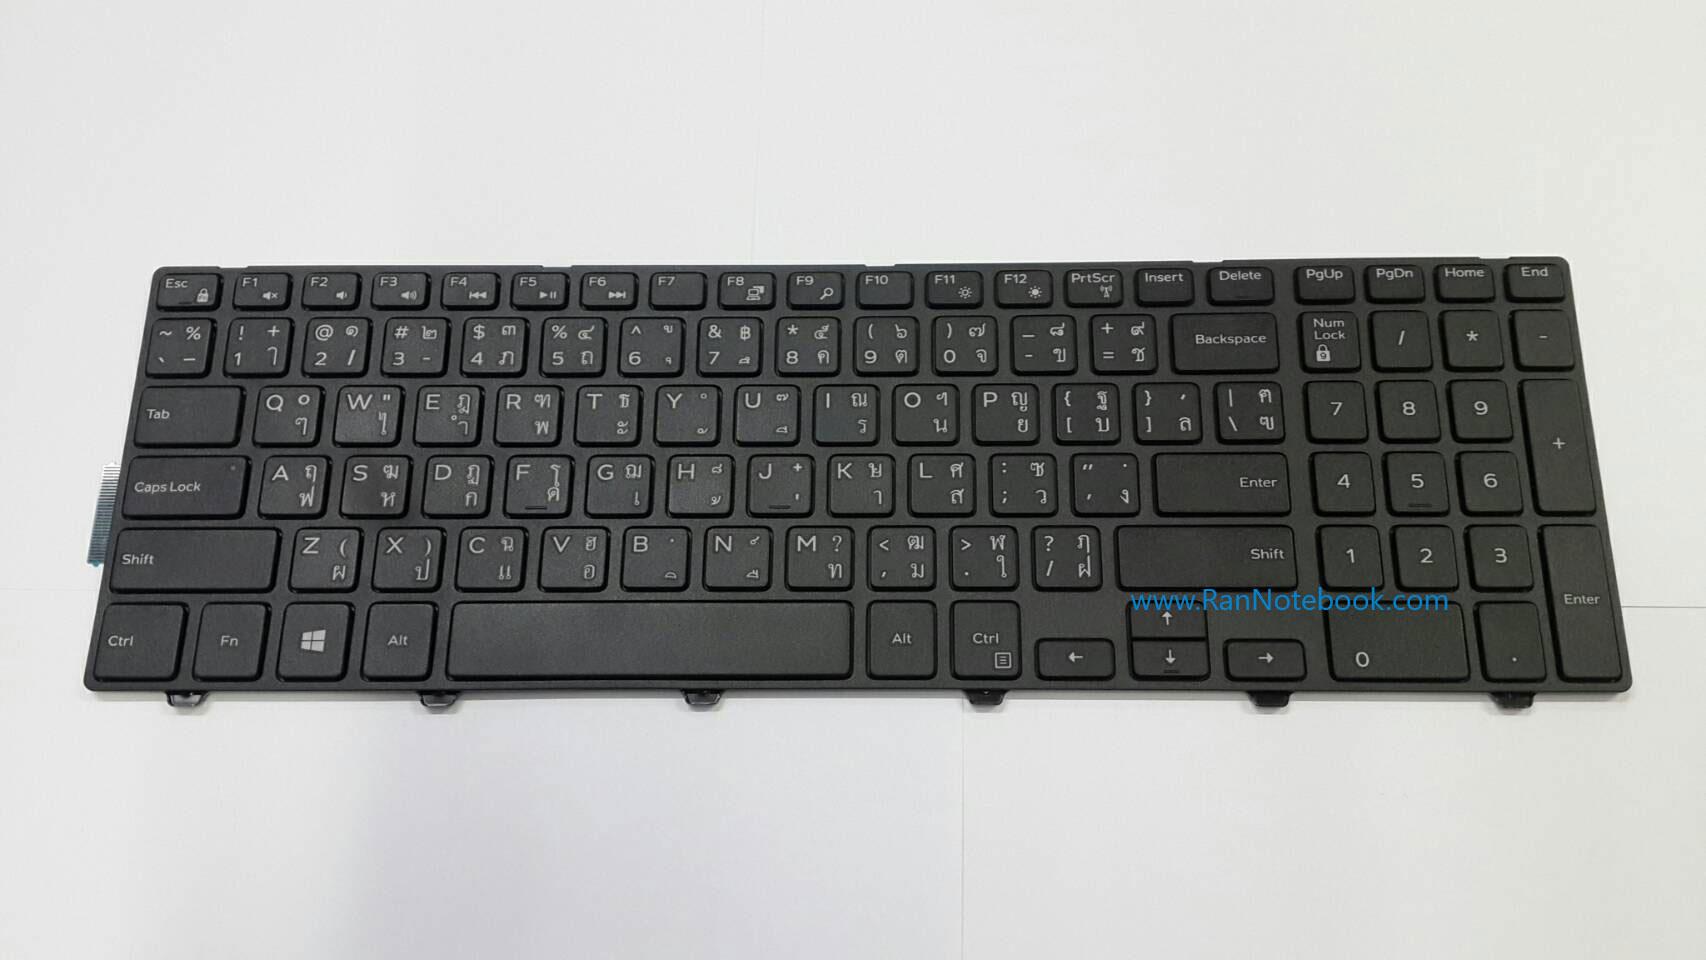 Keyboard Dell inspiron 5547 คีย์บอร์ด โน๊ตบุ๊ค Dell inspiron 15 5000